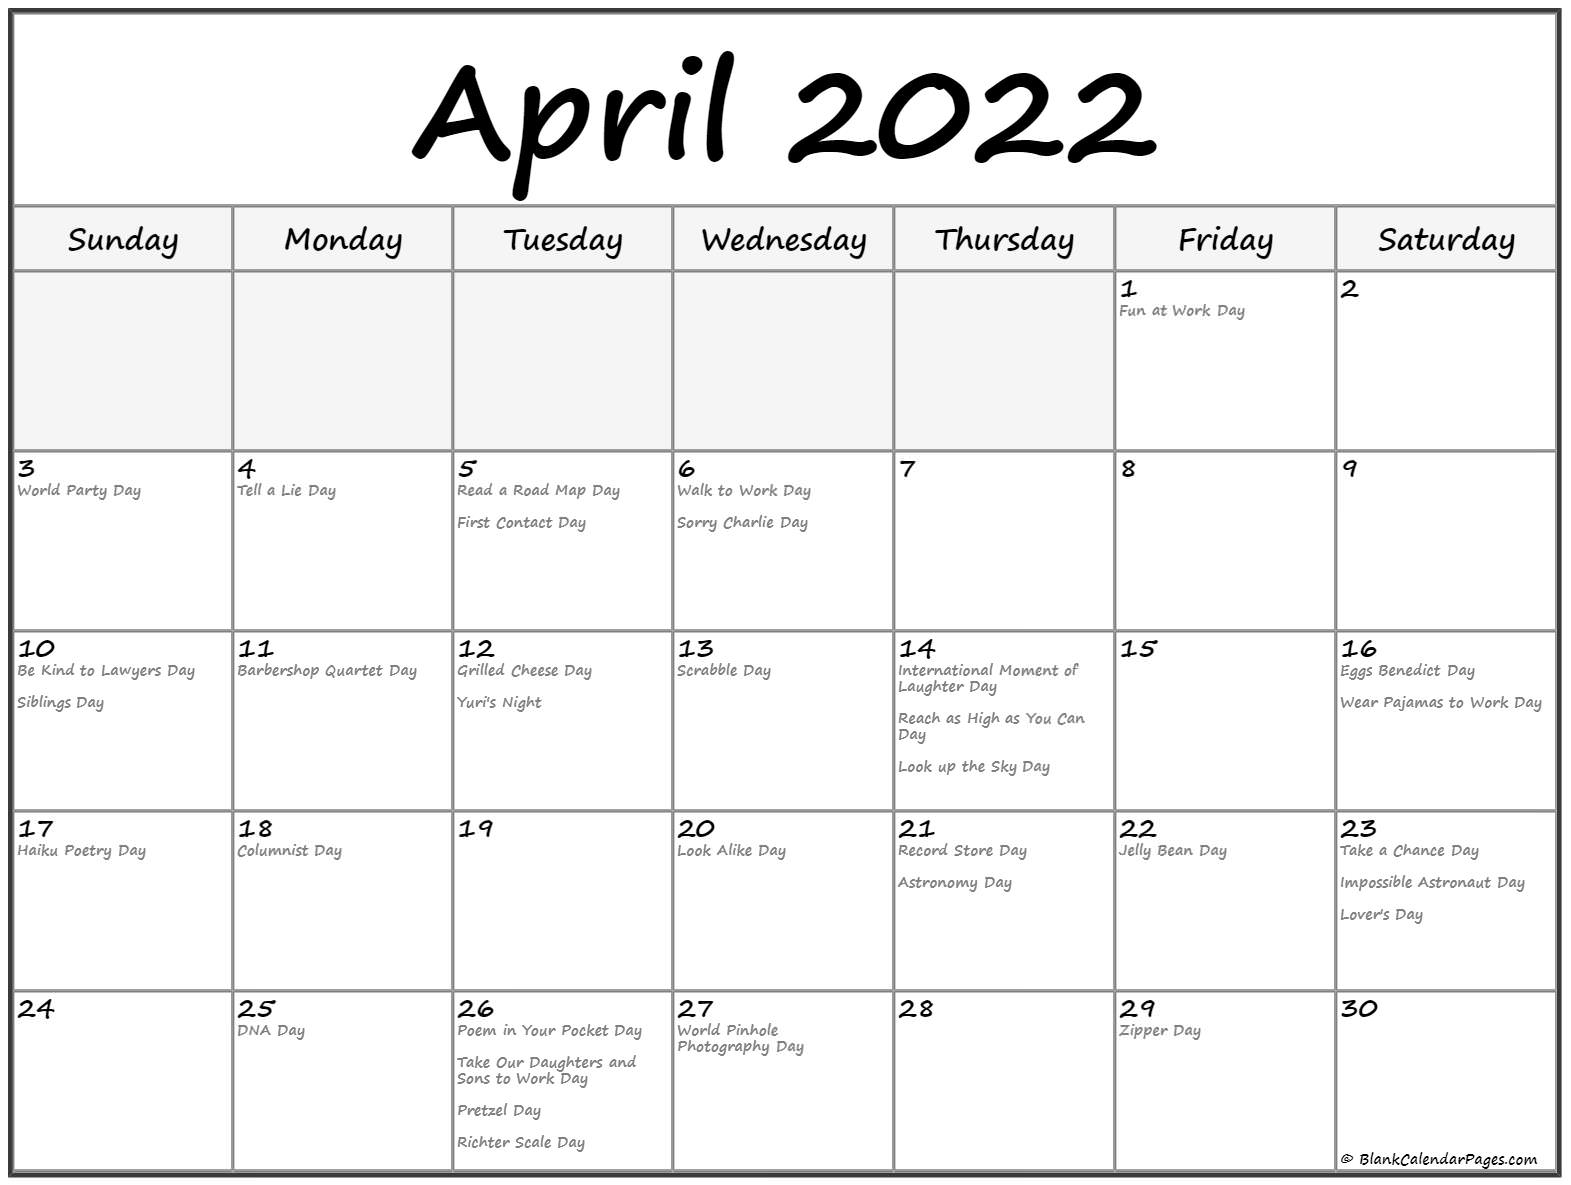 Gujarati Calendar 2022 April